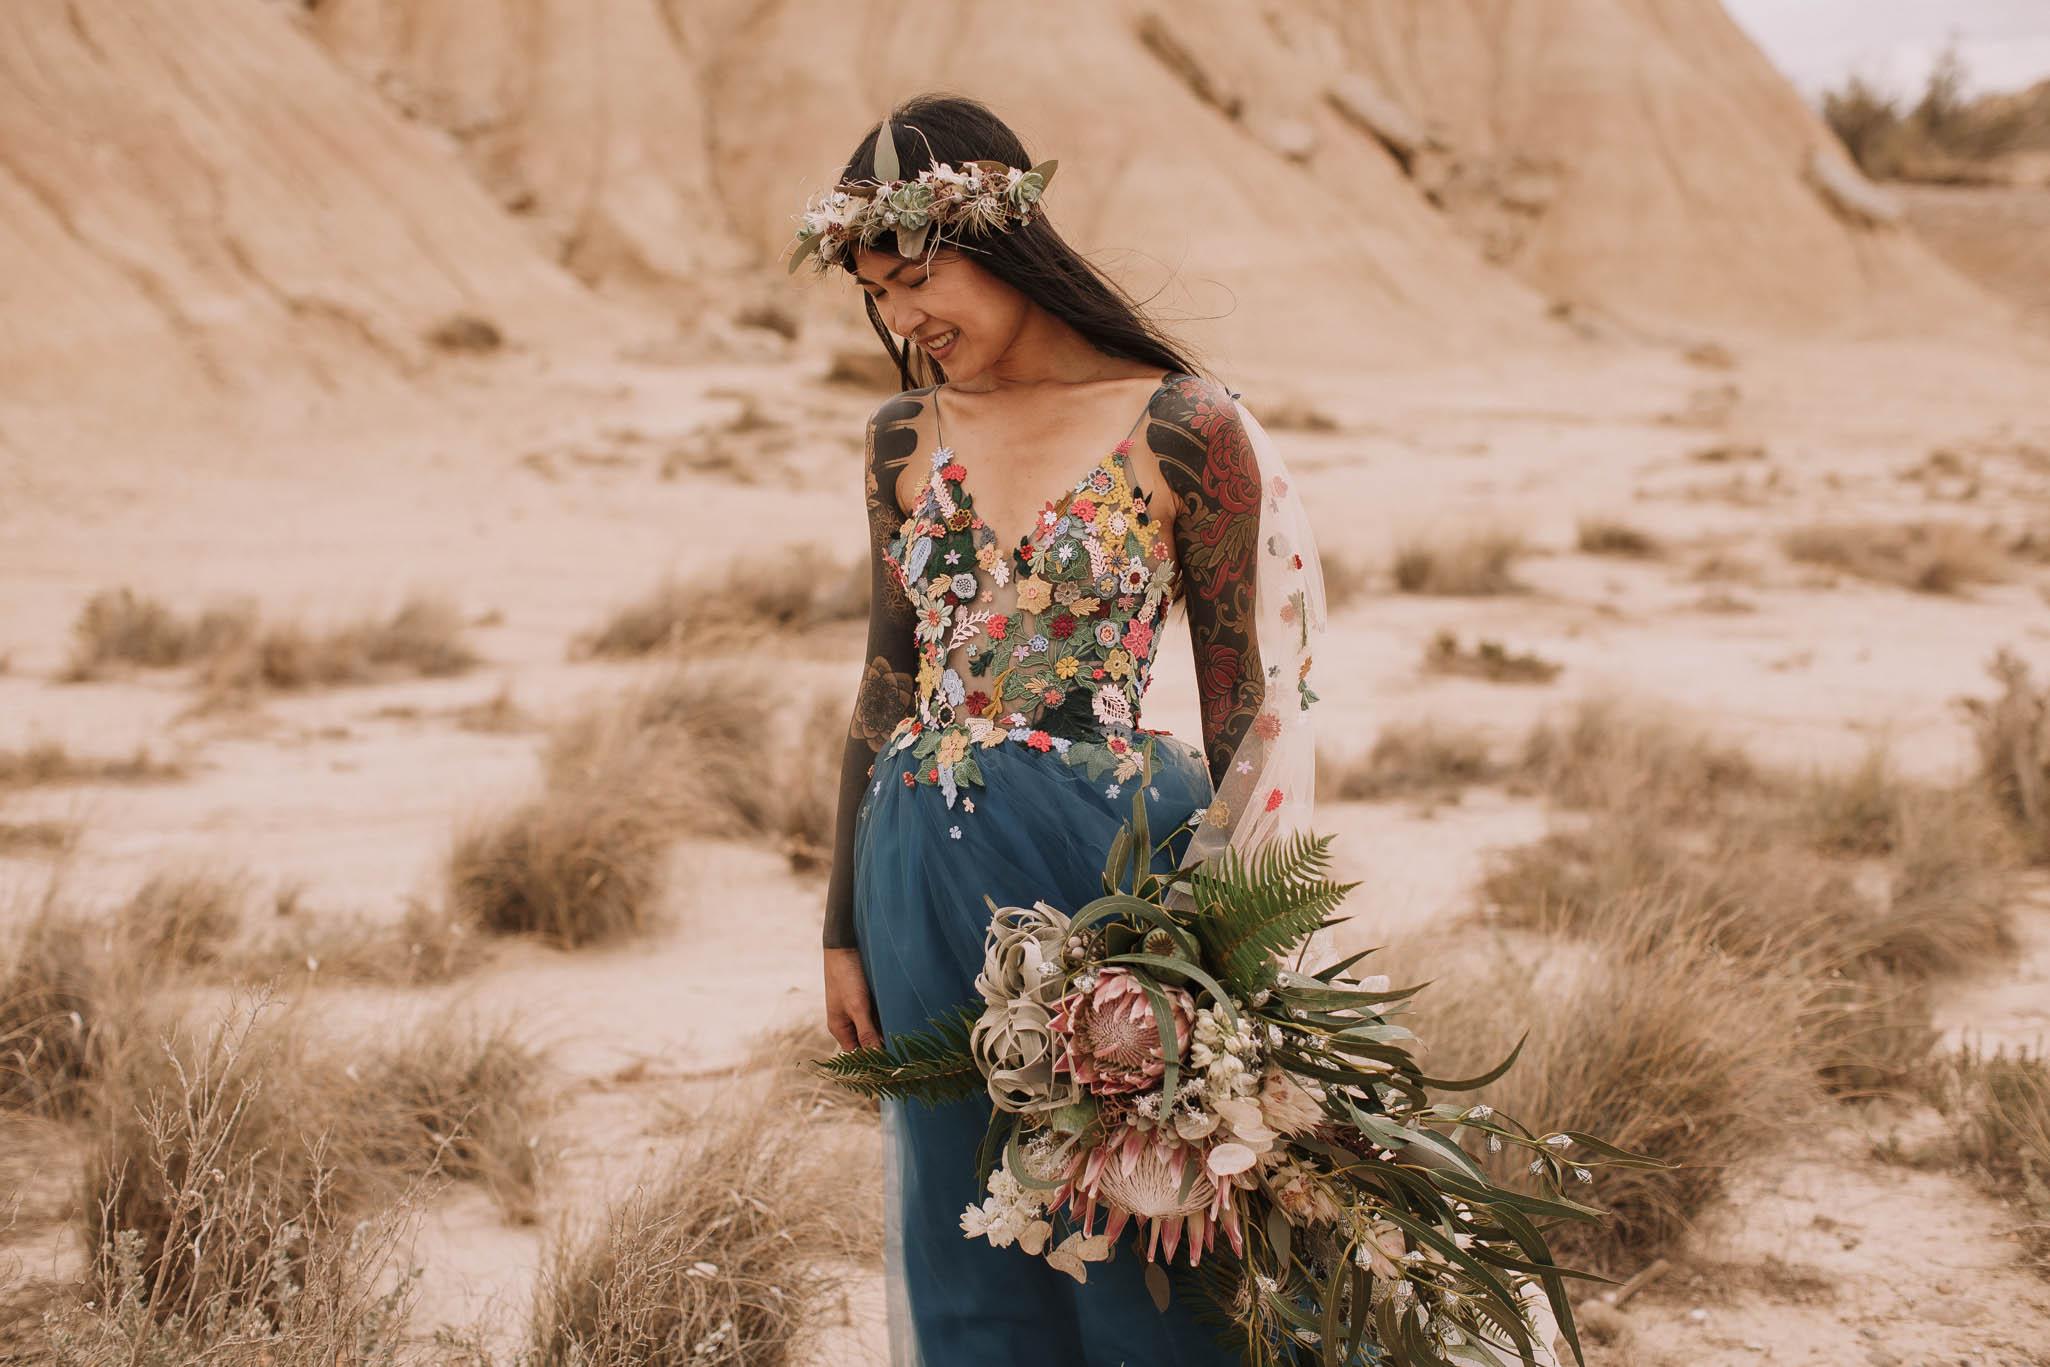 Spain-wedding-photographer-bardenas-reales-jeremy-boyer-photographe-mariage-bordeaux-floral-wedding-dress-robe-72.jpg